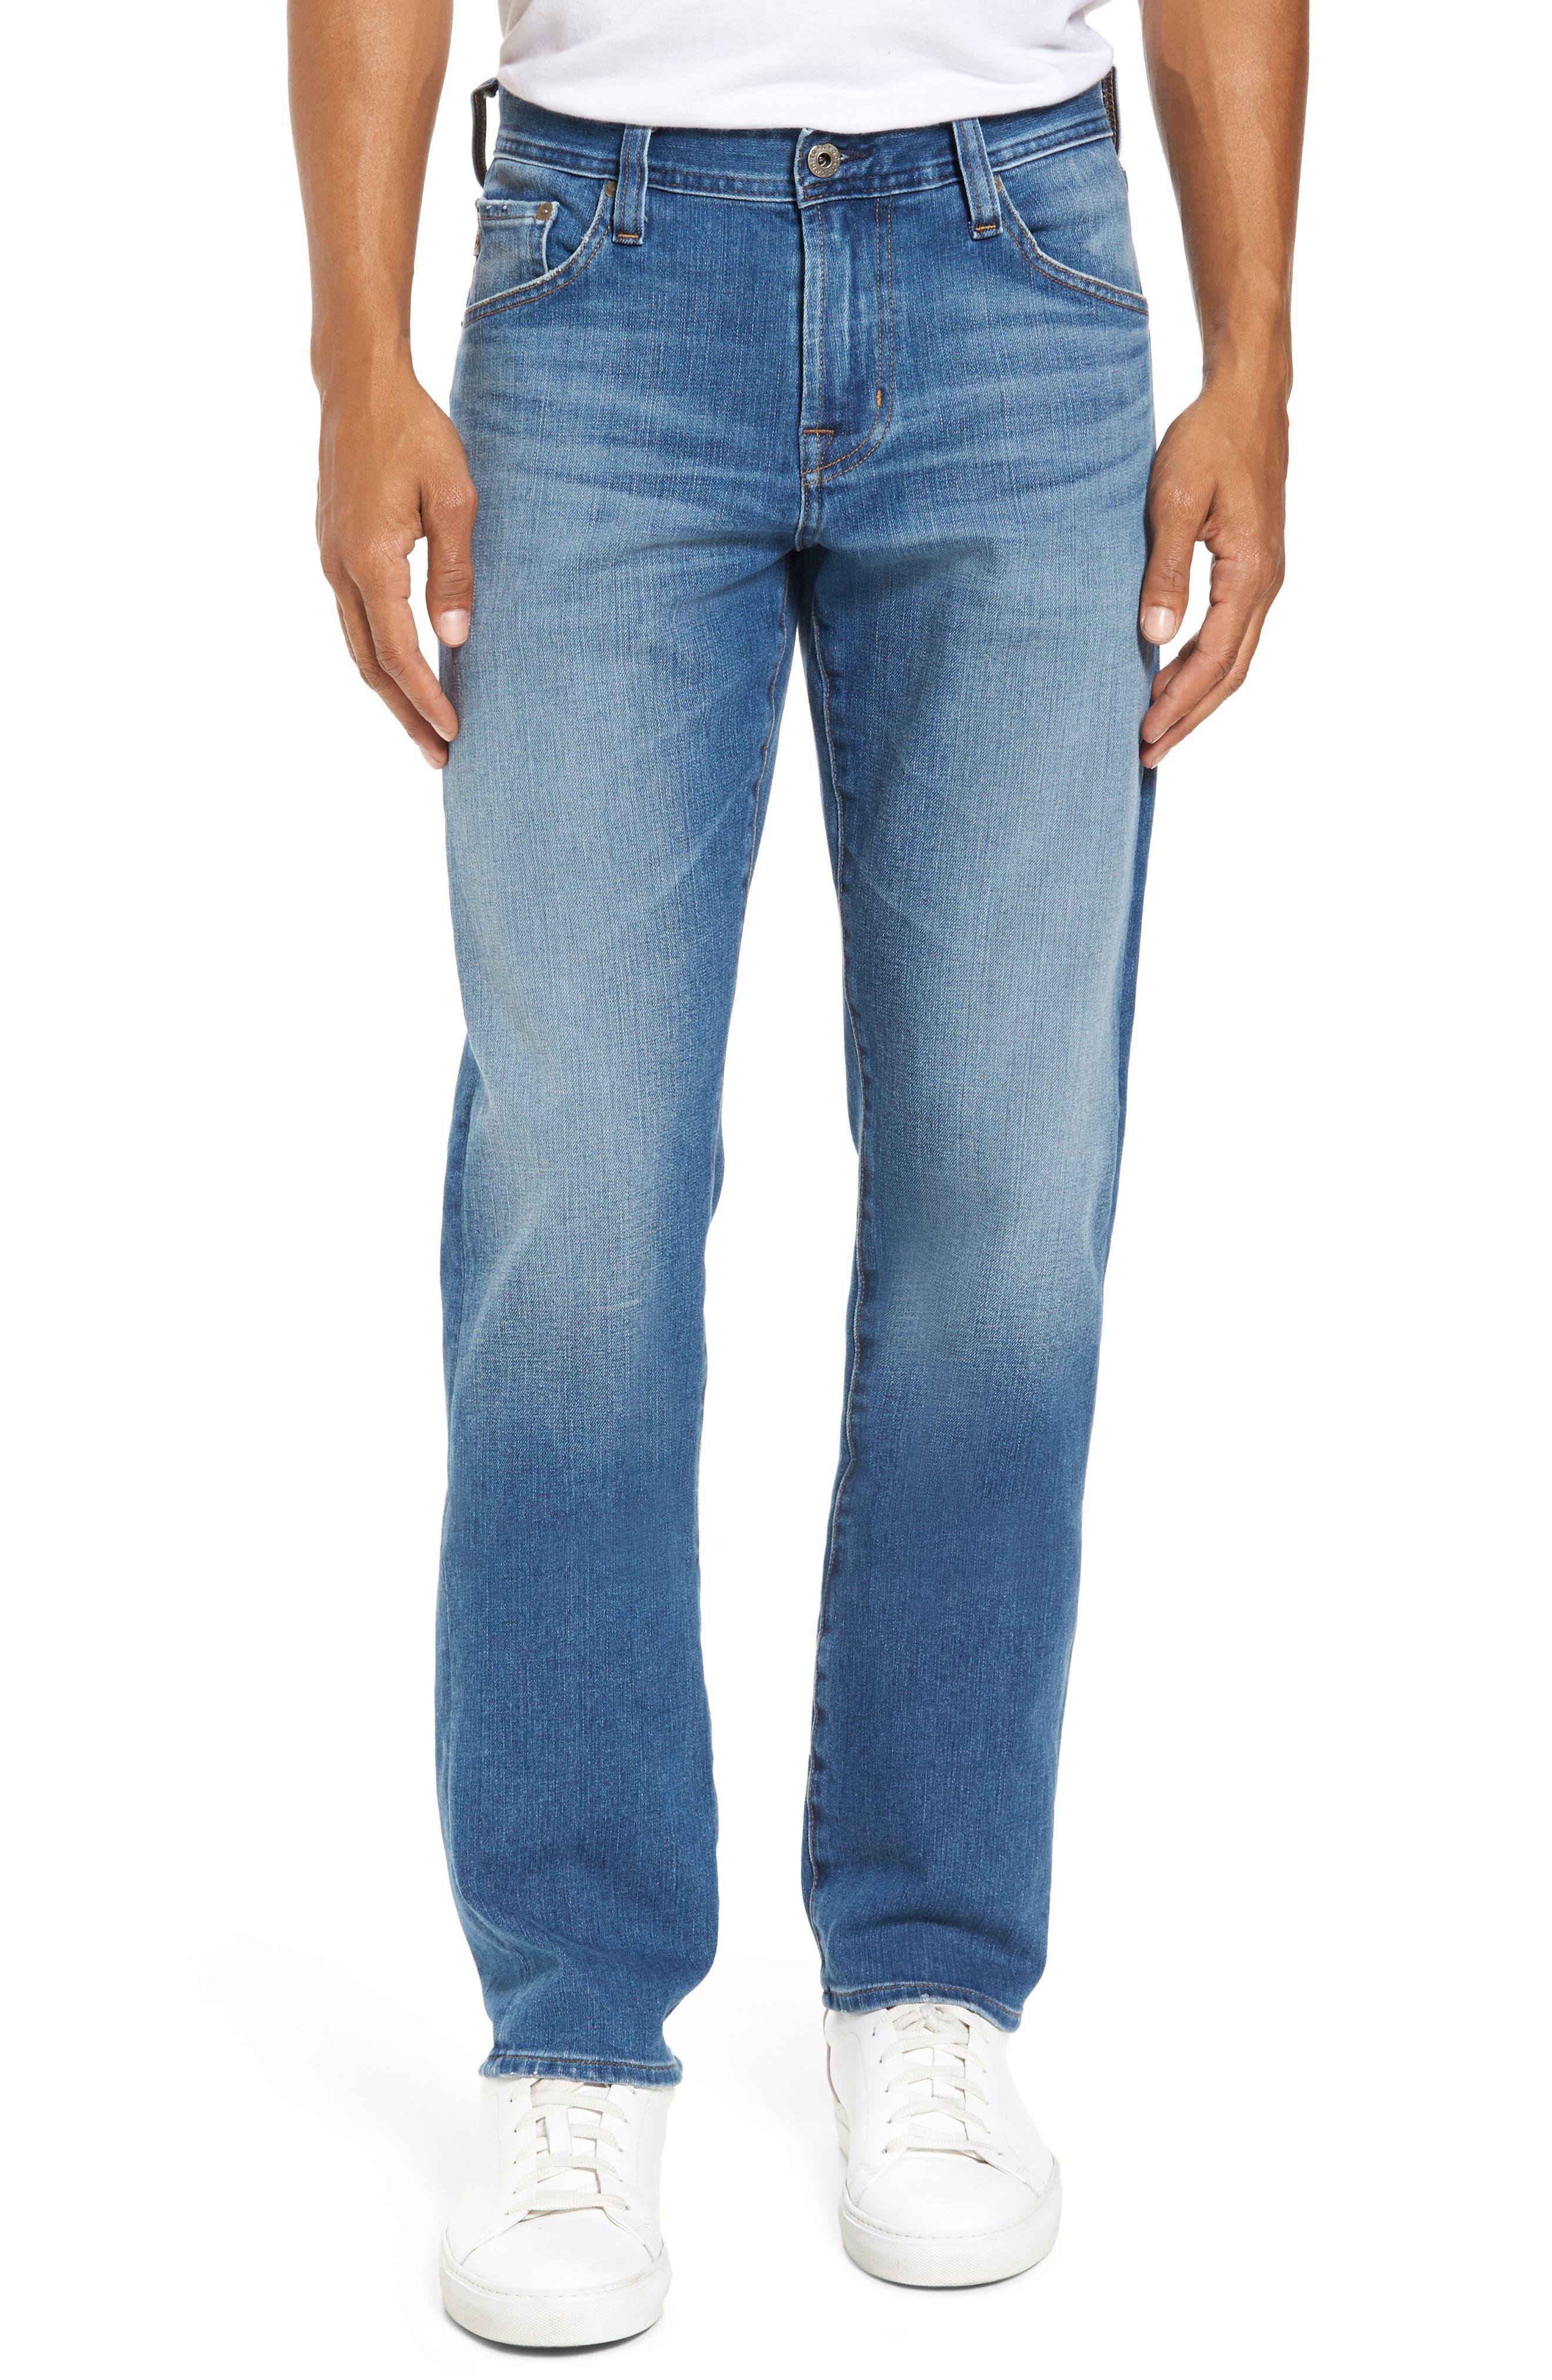 Graduate Slim Straight Fit Jeans,                         Main,                         color, 456